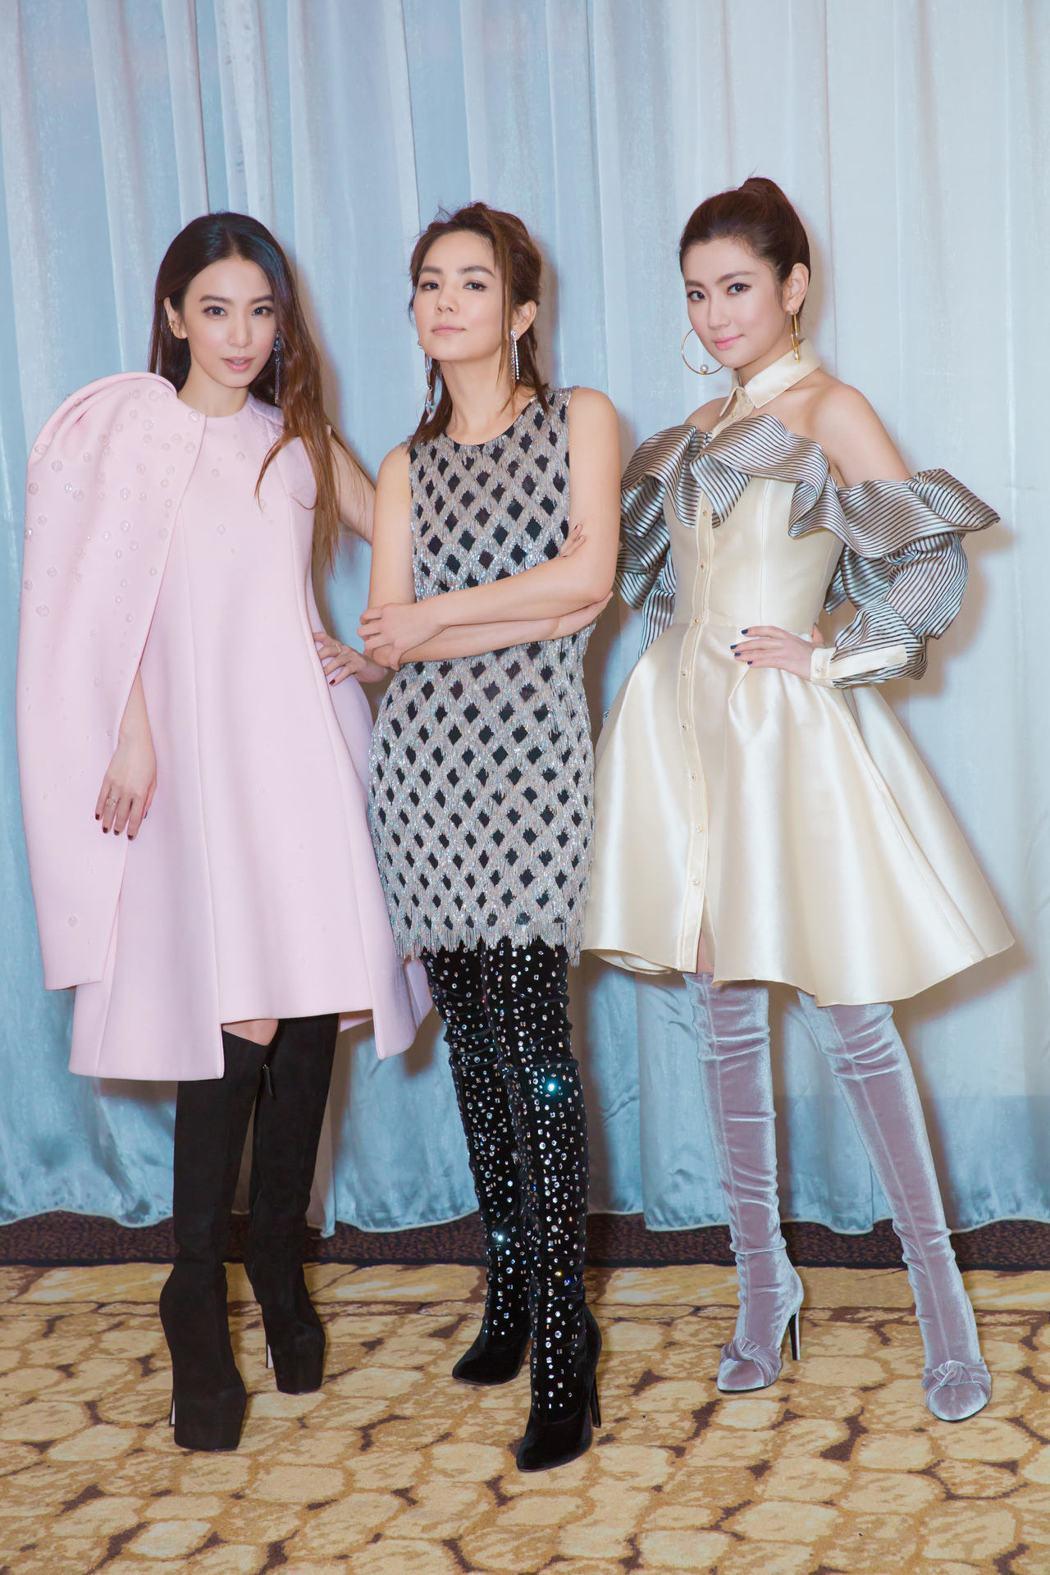 Hebe(左起)、Ella、Selina今年將歡慶S.H.E出道17周年。圖/華...